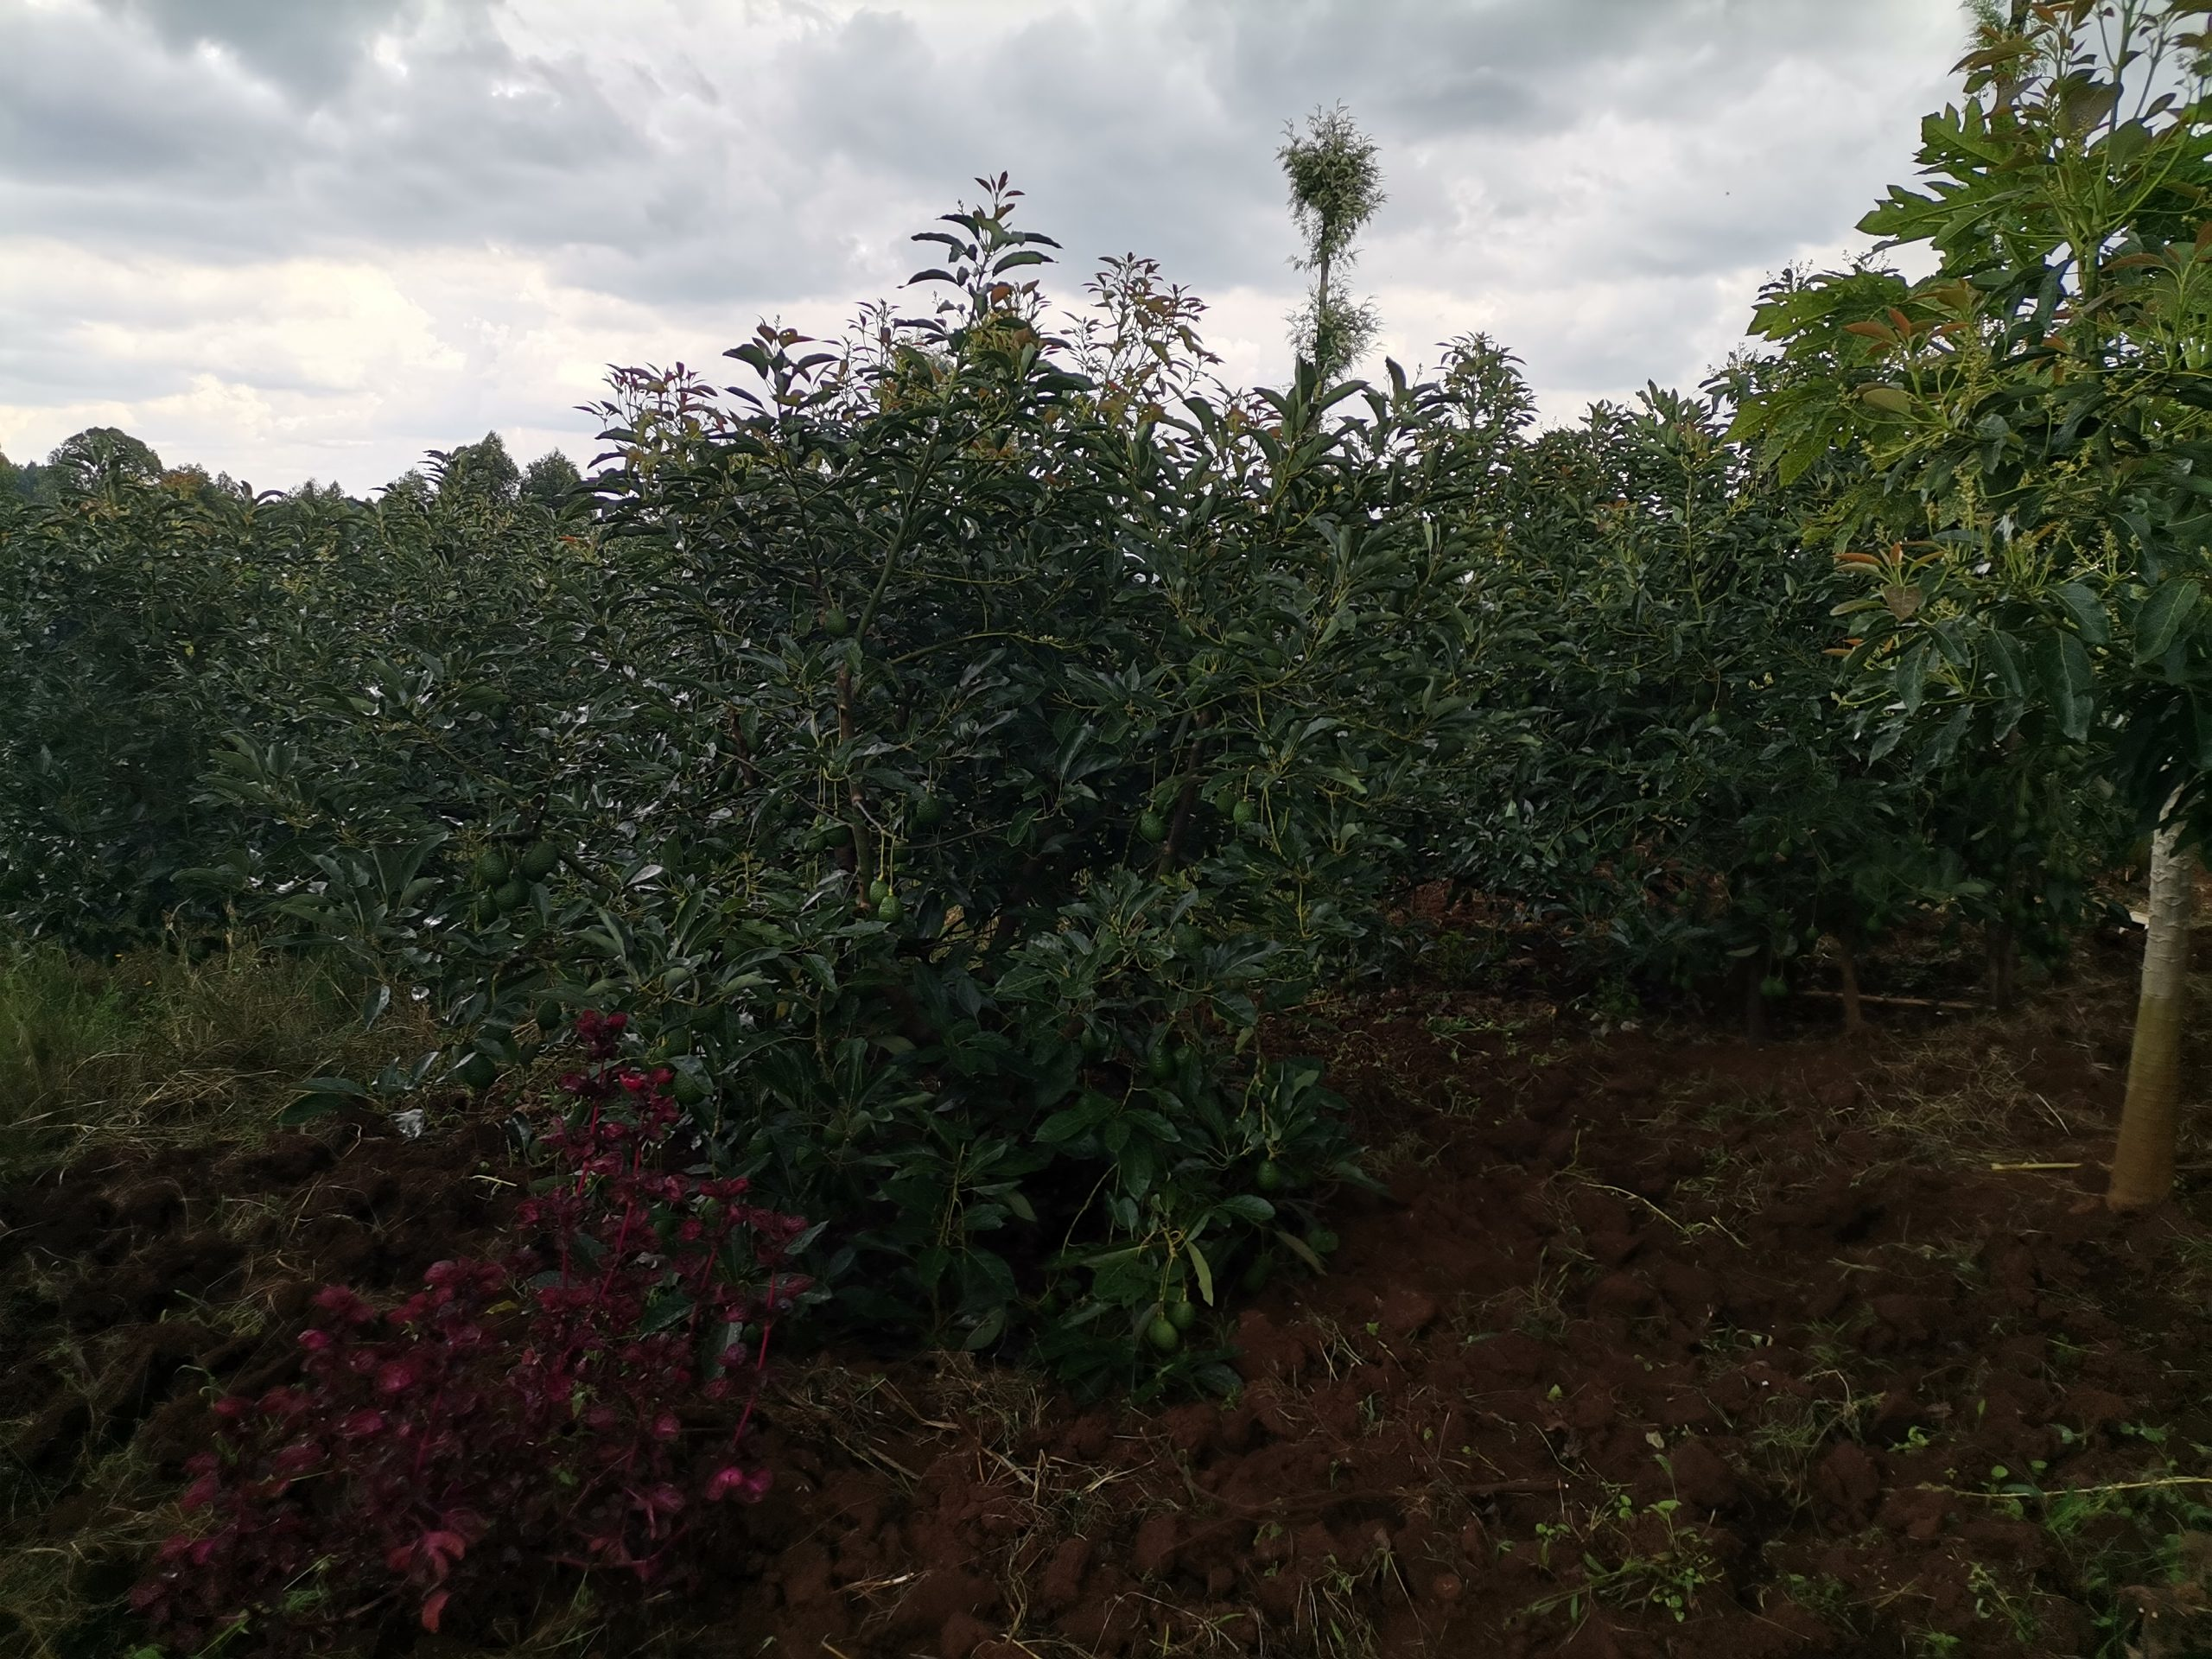 A Hass Avocado Tree that has already produced fruit